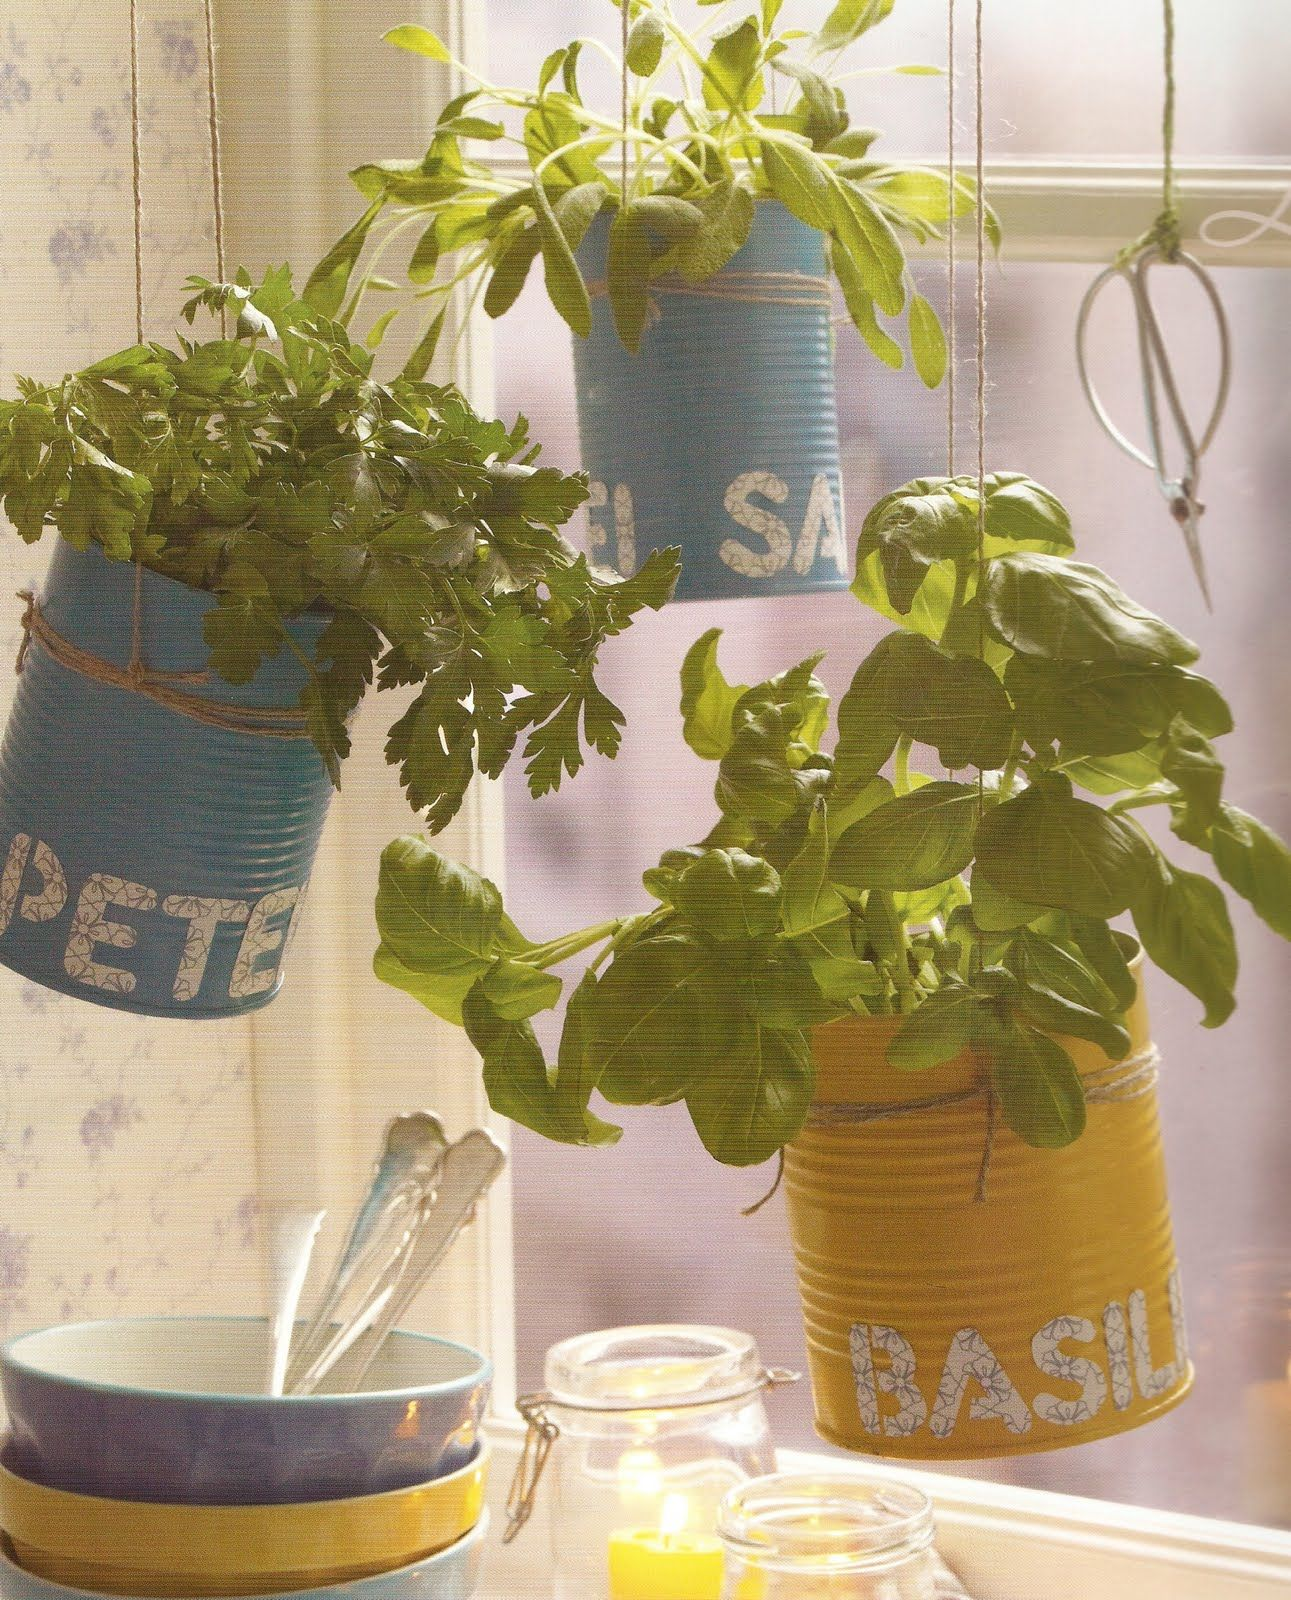 Diy Project Ideas For Your Herbs Diy Gartenbau Pflanzen Zimmerpflanzen Ideen